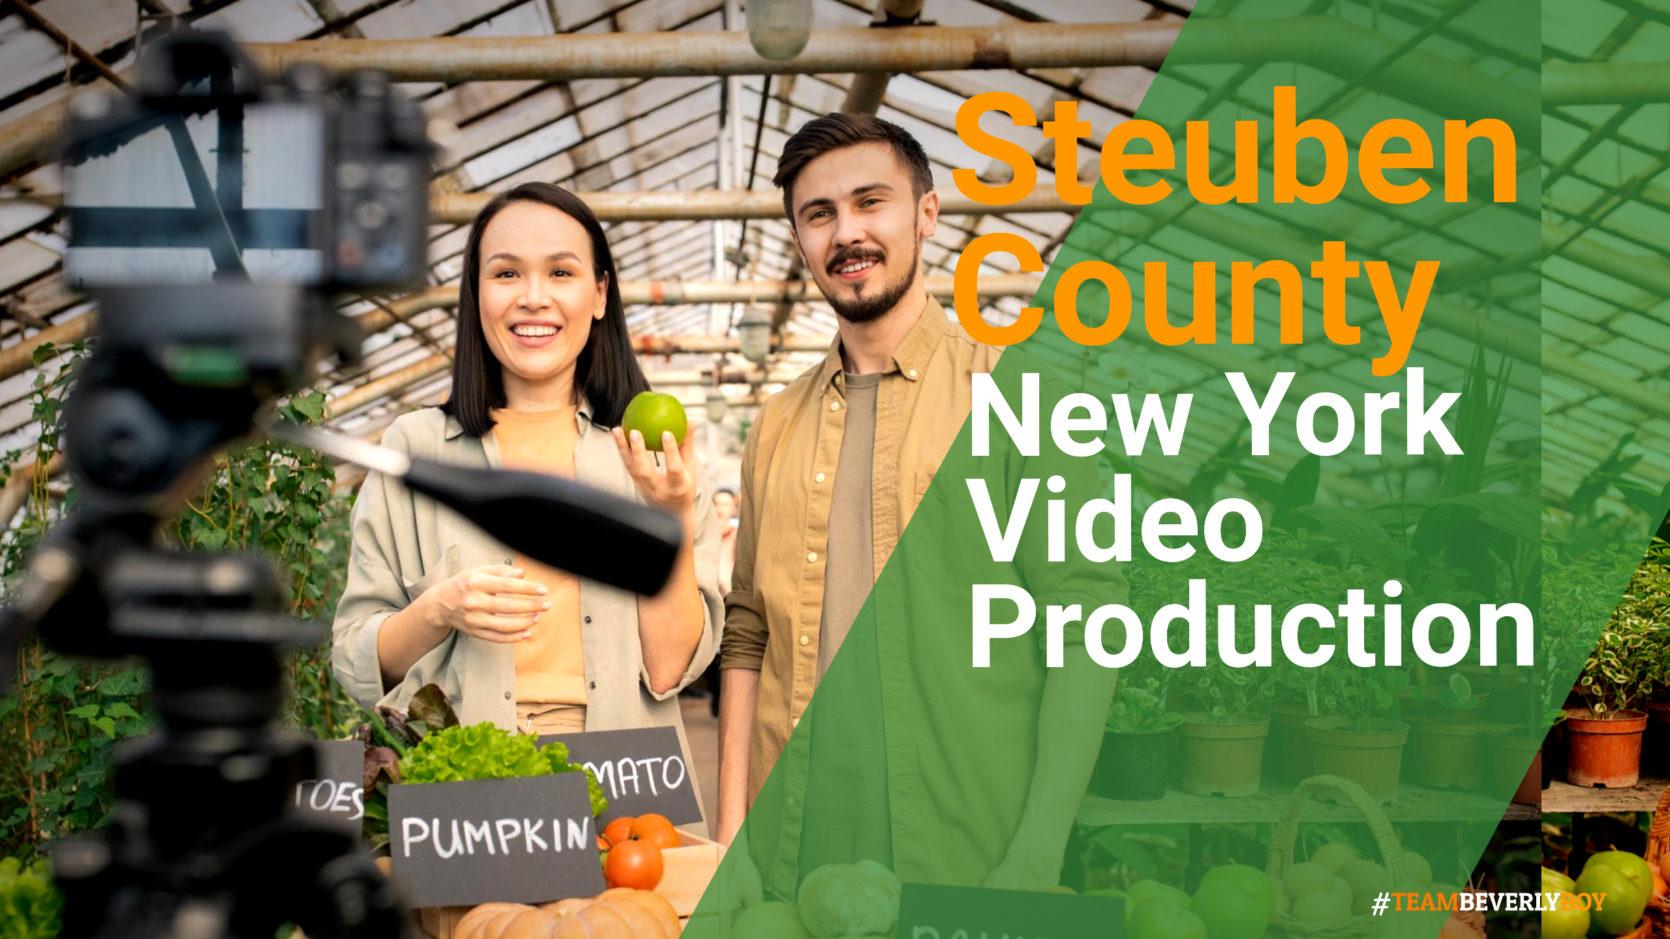 Steuben County NY Video Production